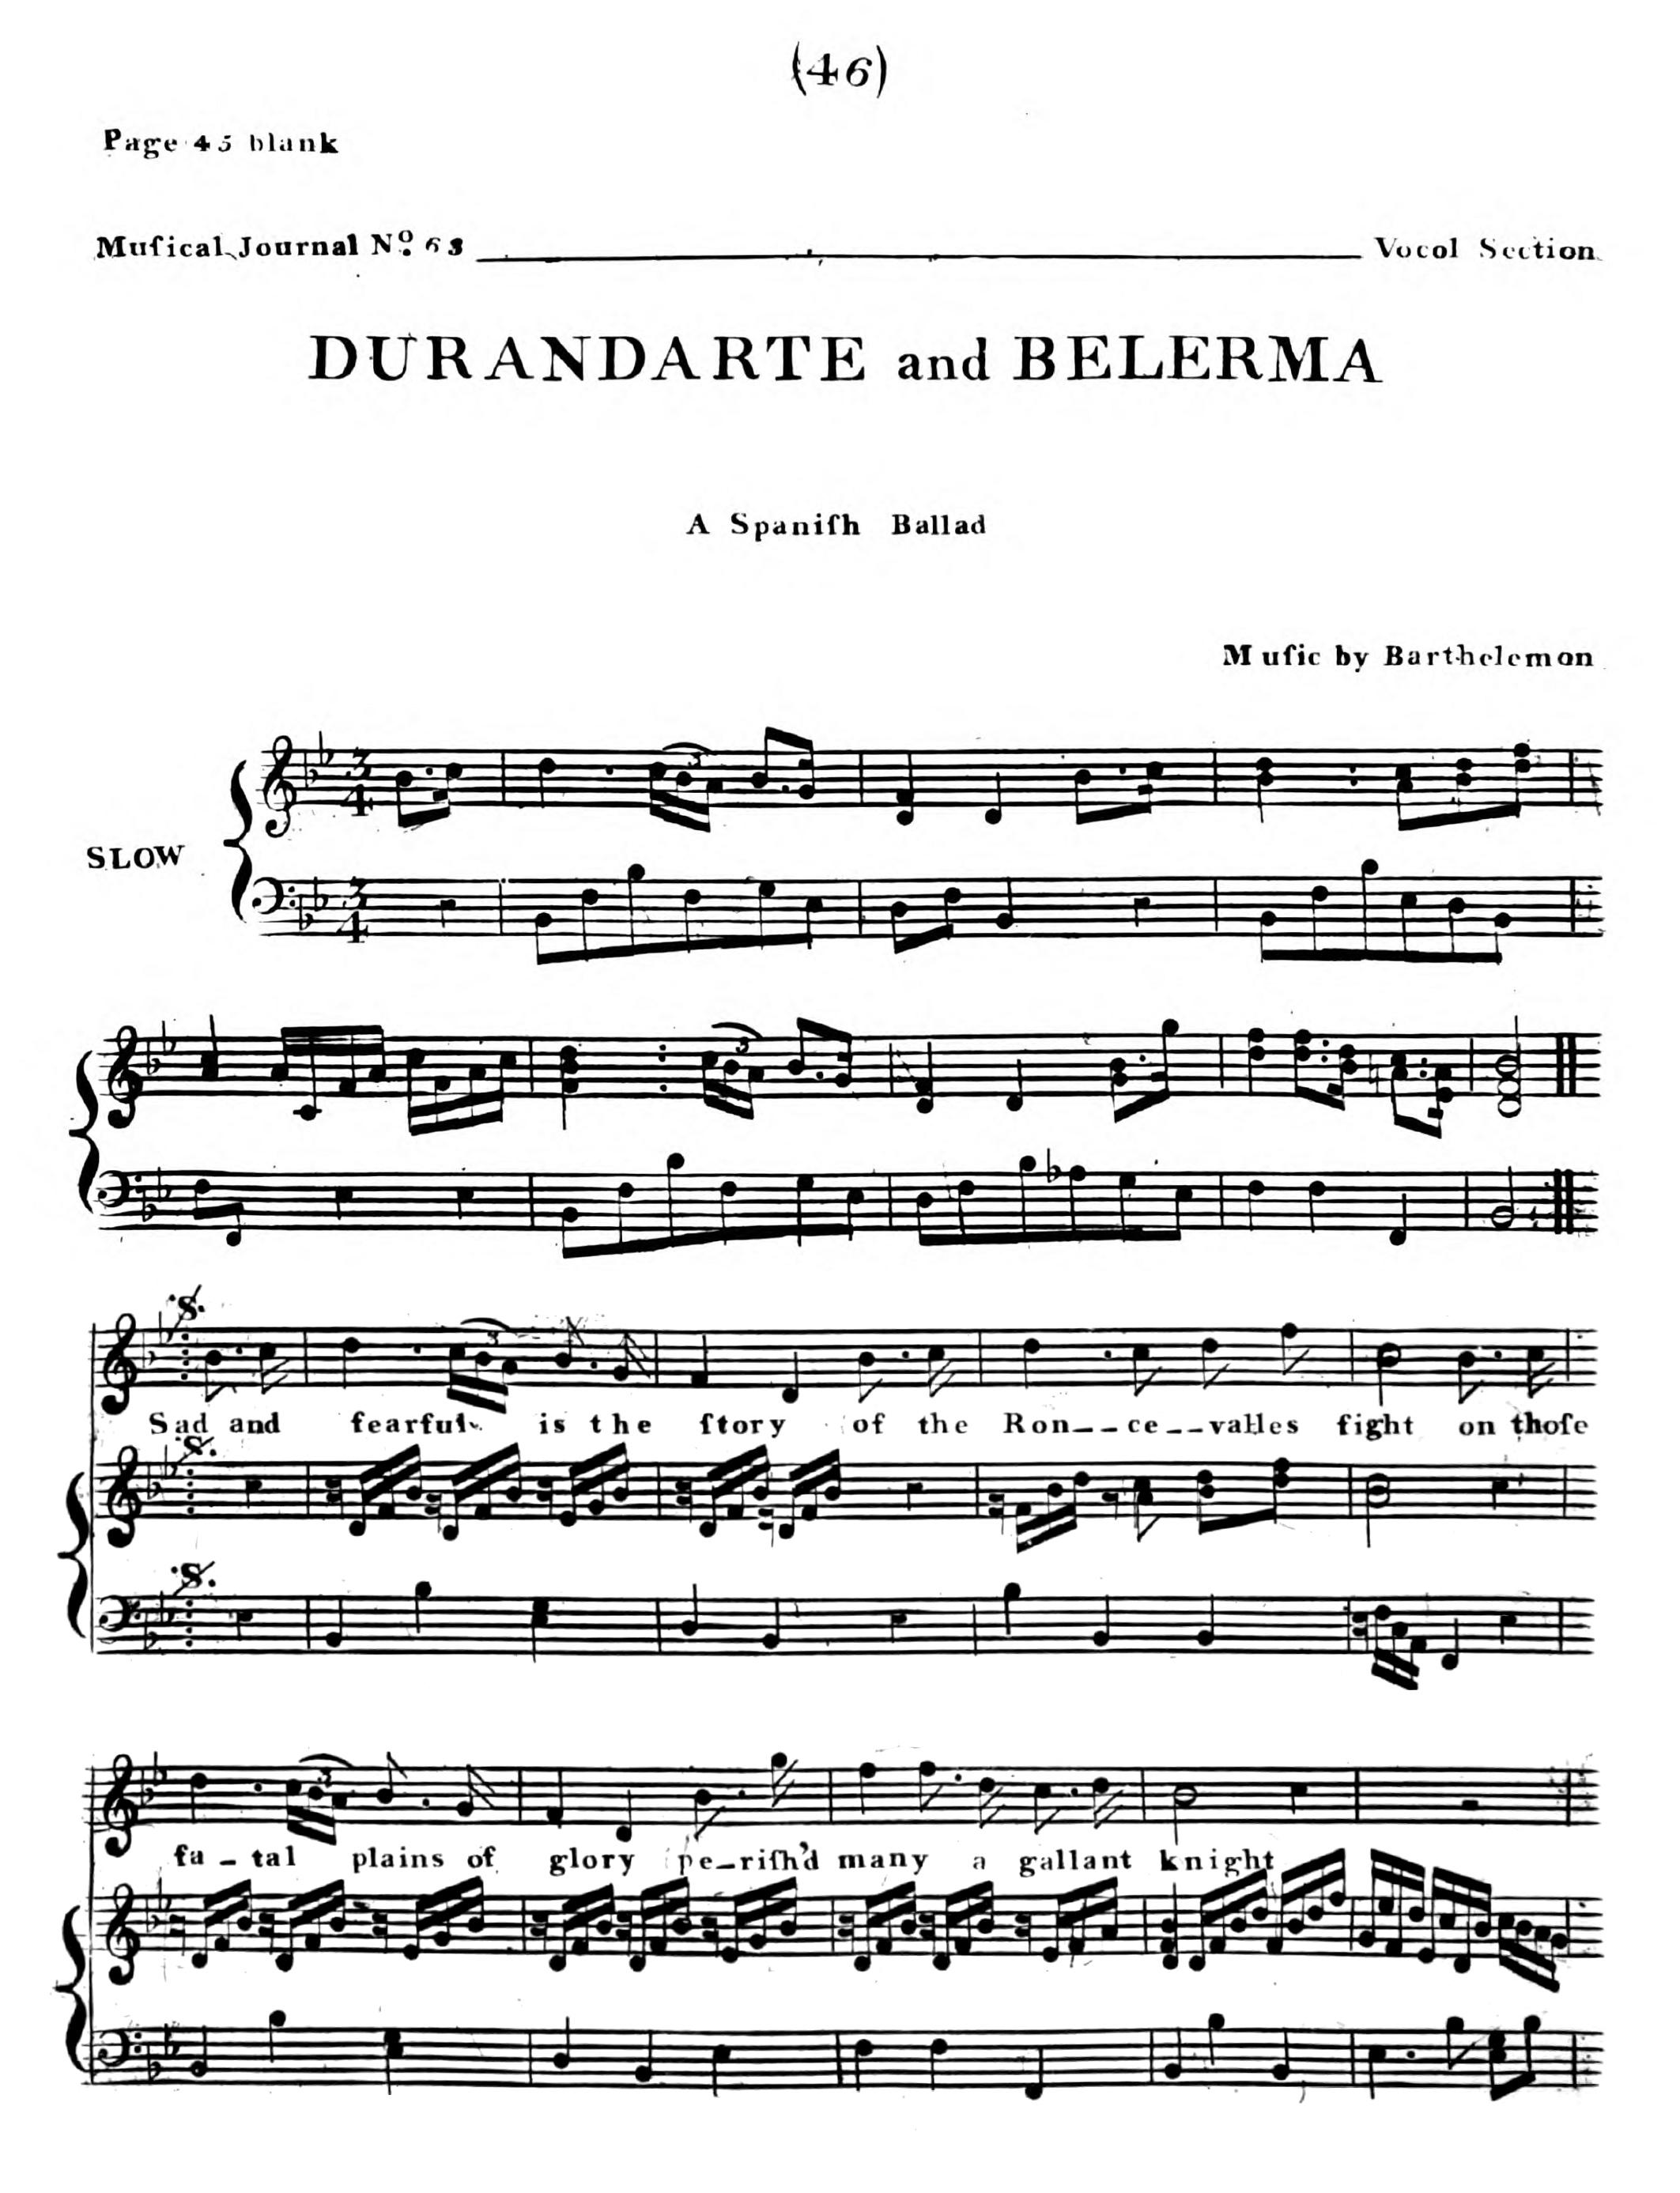 Durandarte-Carr-MusicalJournal-no63.jpg